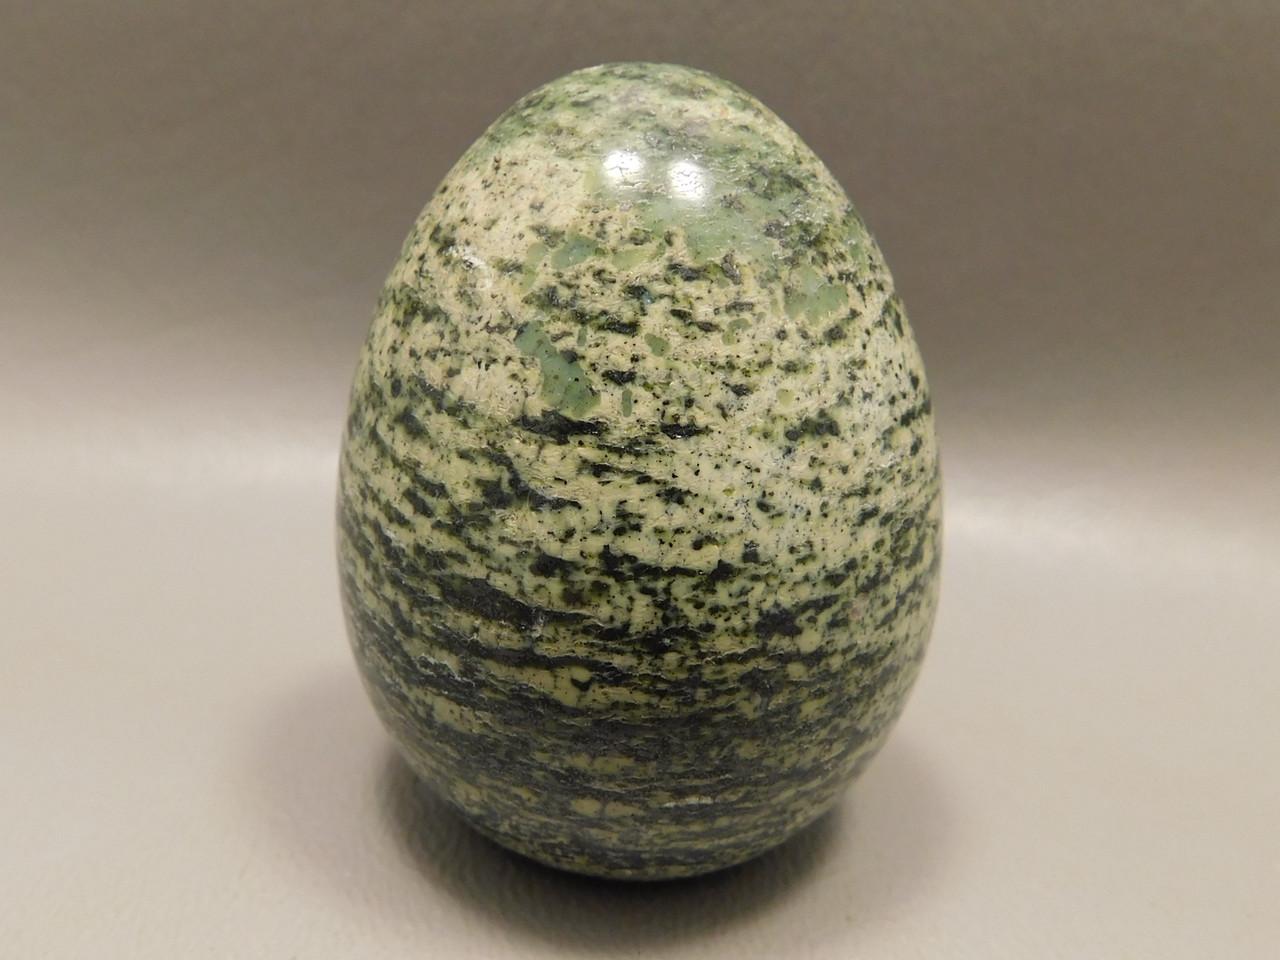 Serpentine Stone Egg 2 inch Green Gemstone South Africa Rock #O1